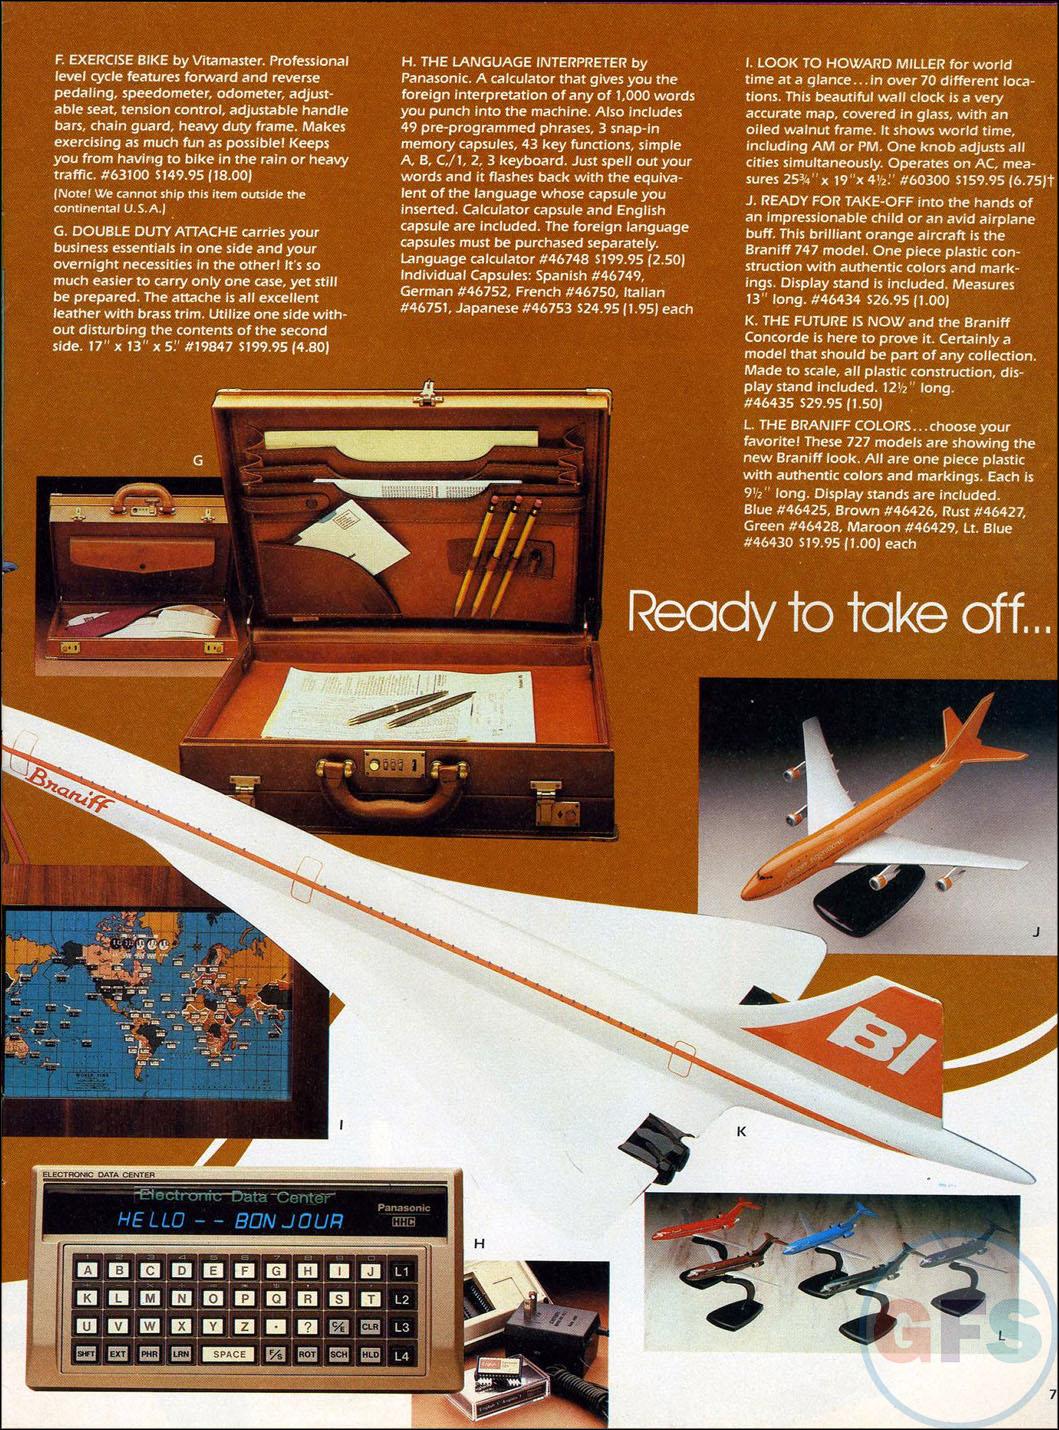 Braniff International Collection Catalog